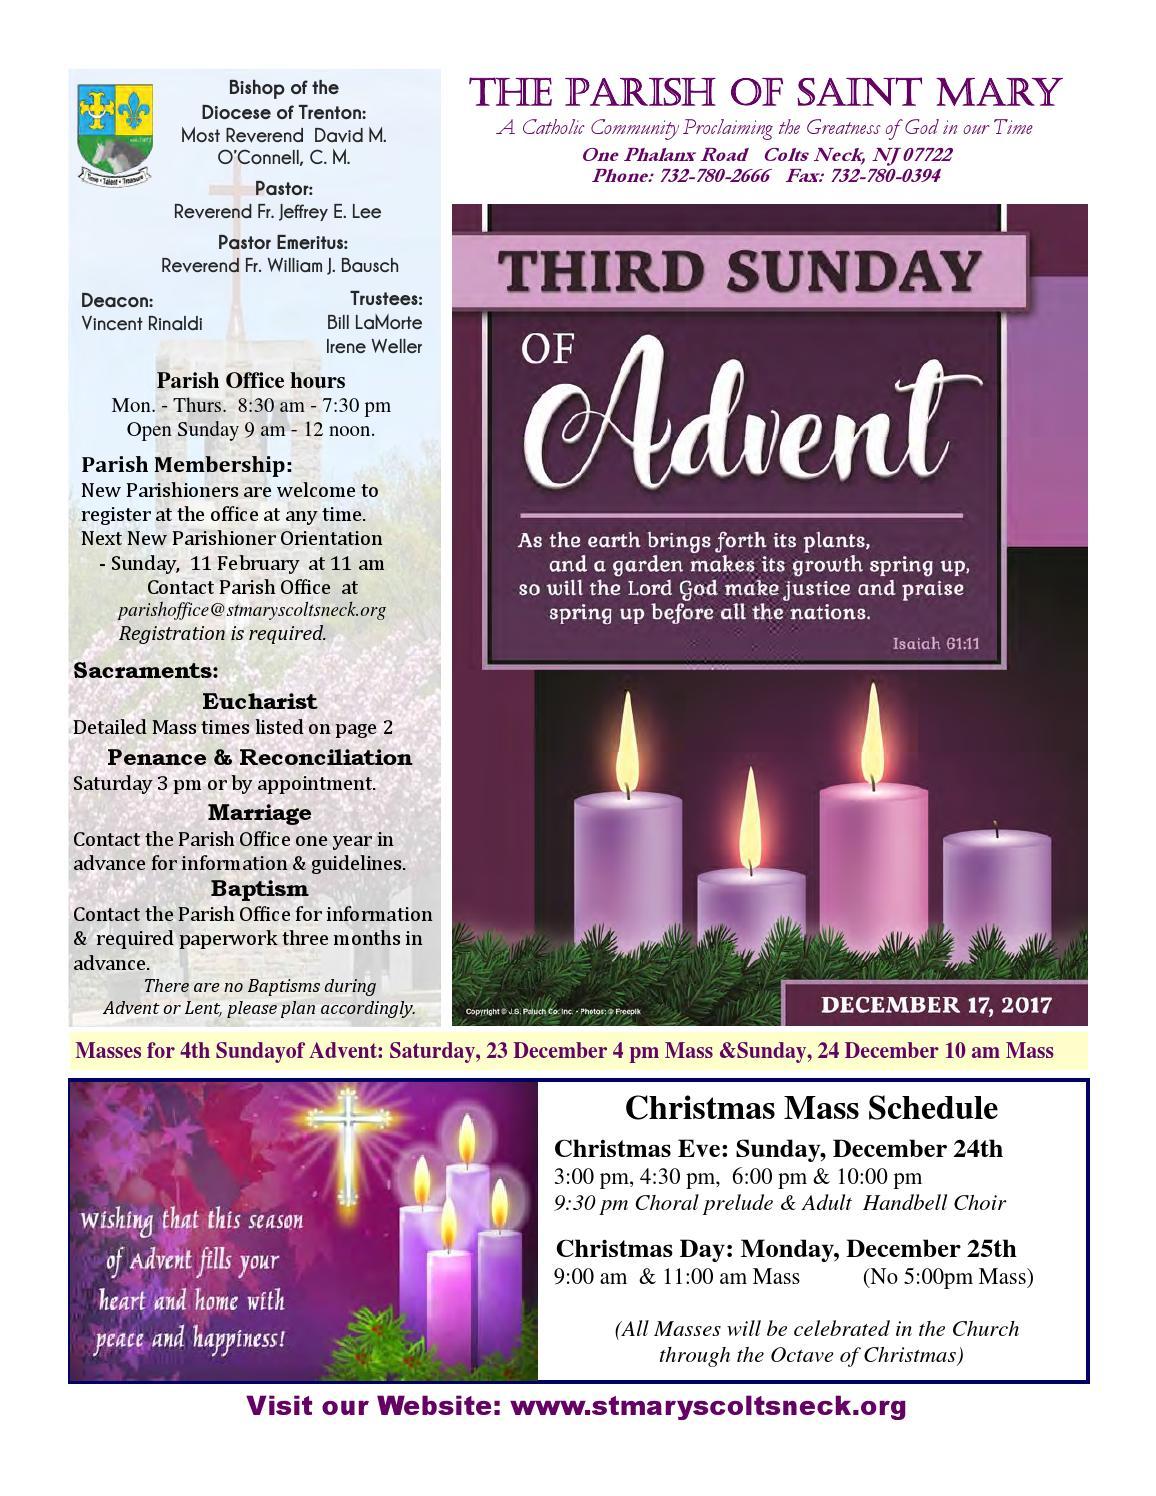 December 17 2017 bulletin by The Parish of Saint Mary - issuu